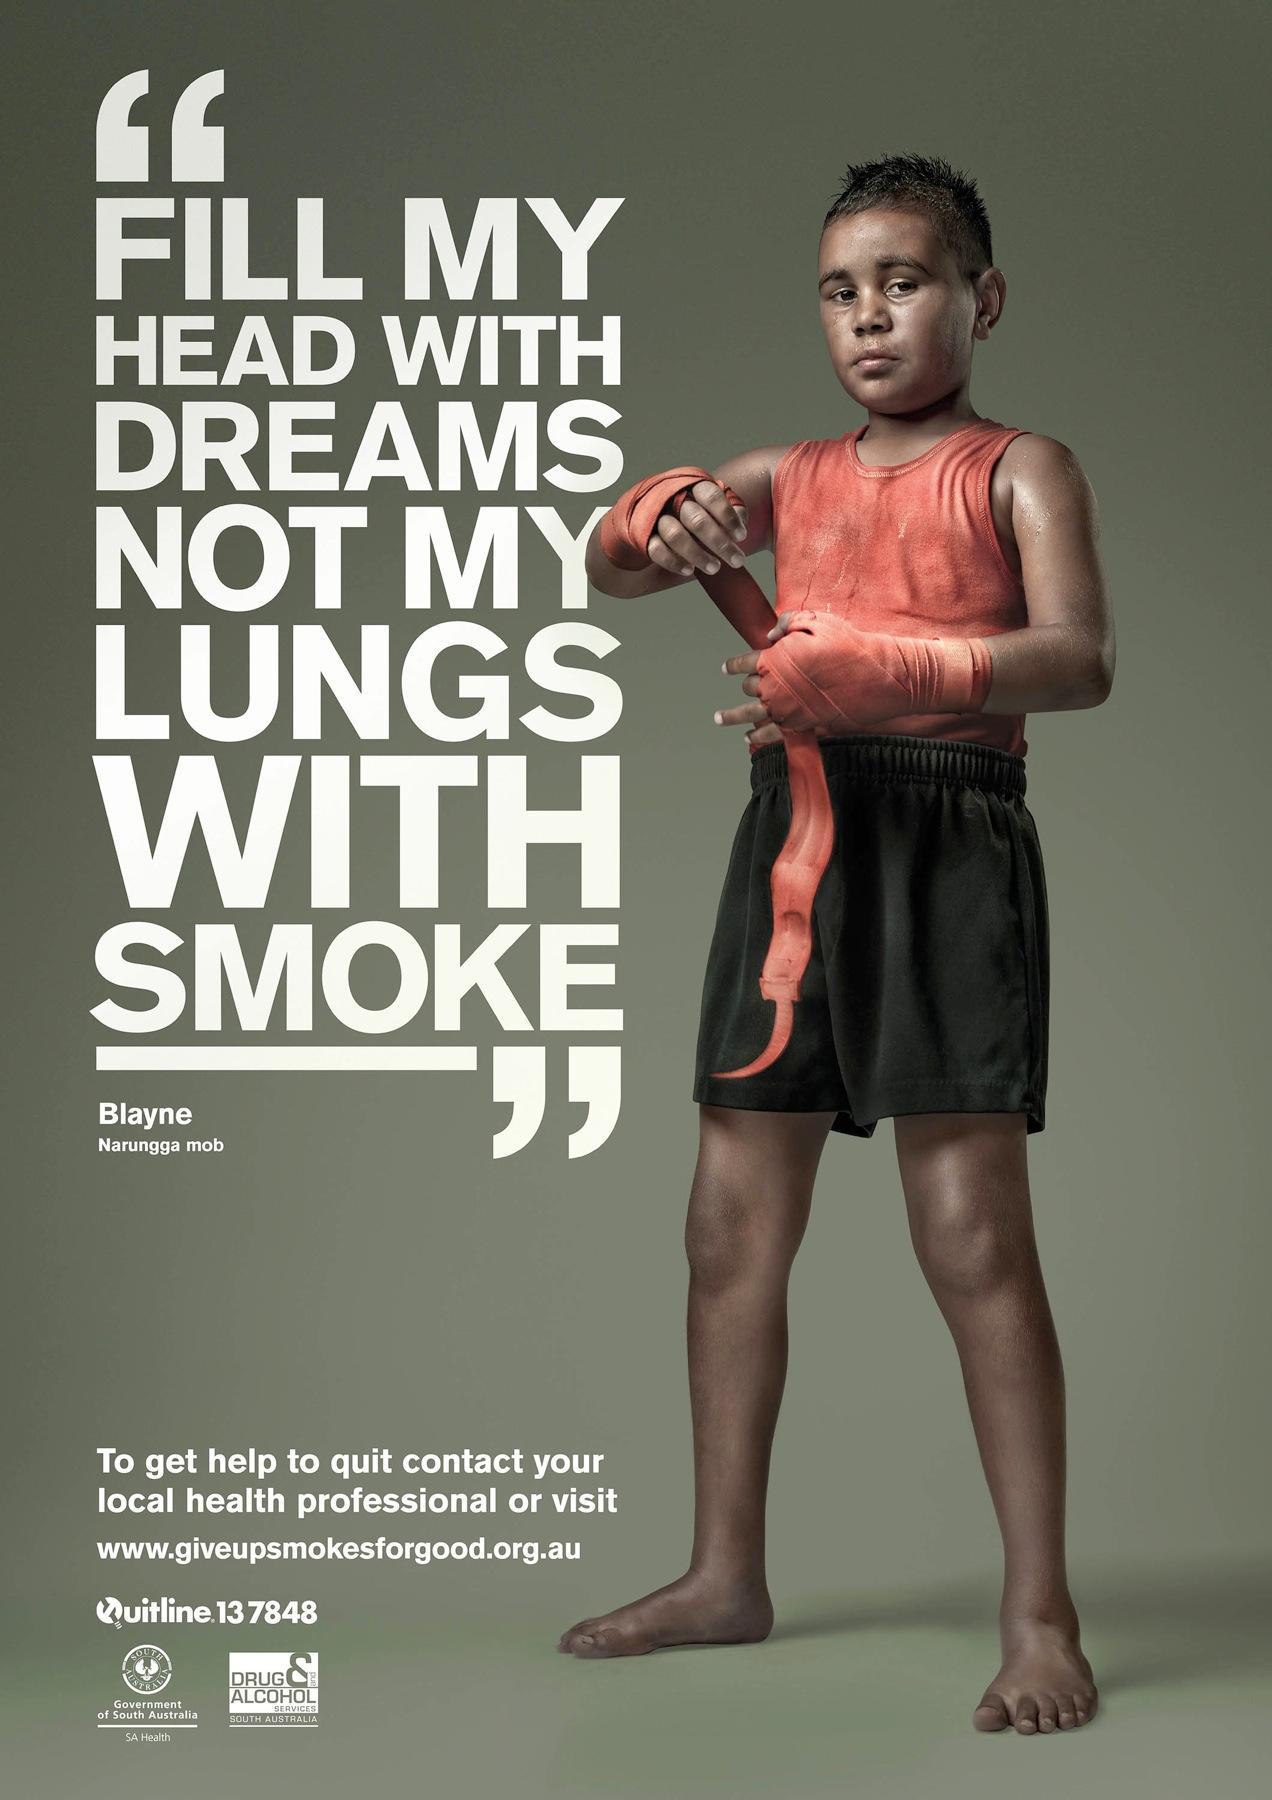 Drug & Alcohol Services South Australia Print Ad -  Blayne